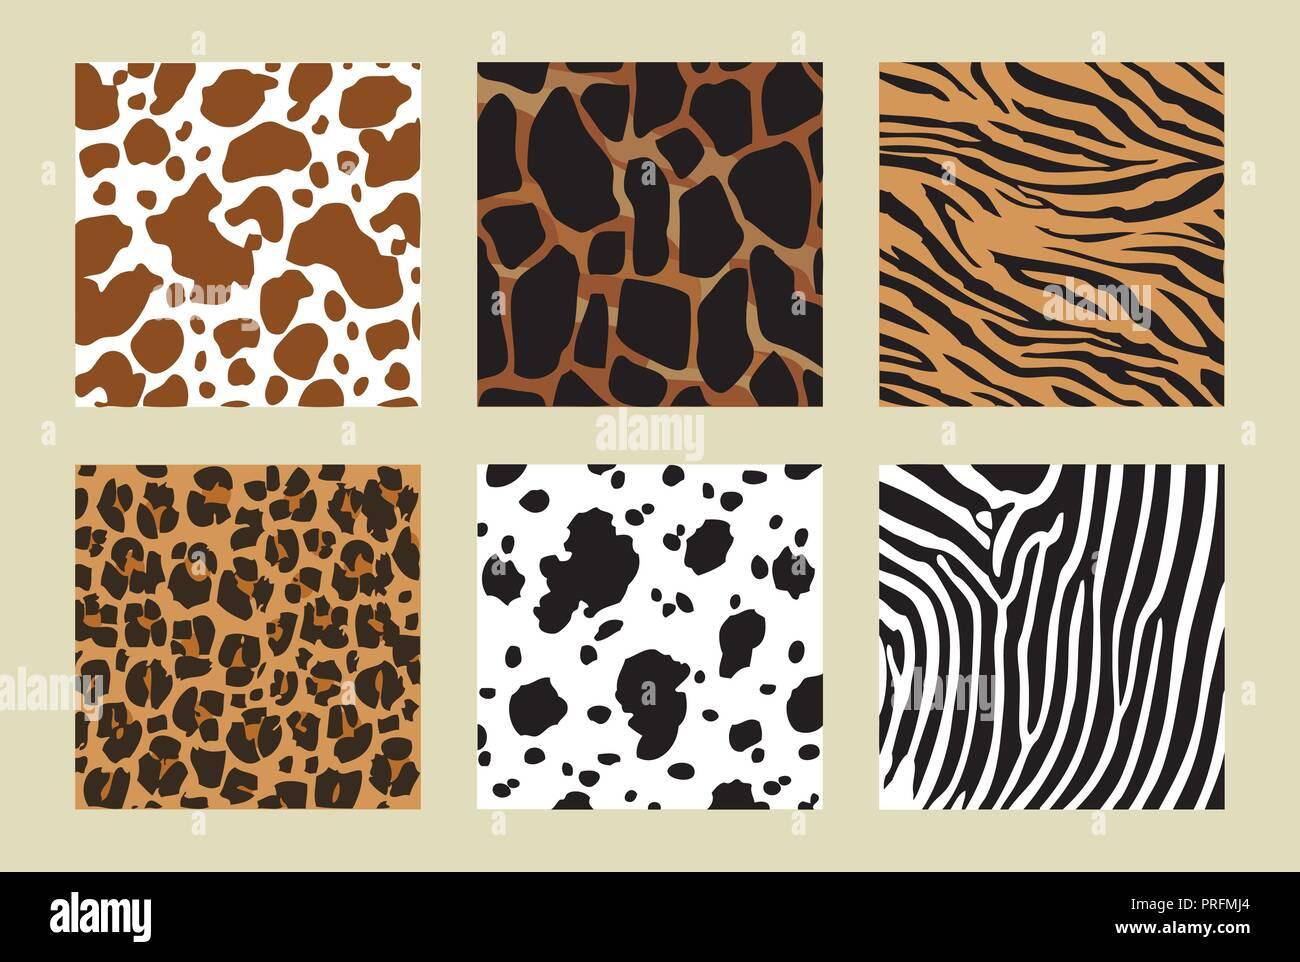 animal skin pattern. six different pattern. Vector illustration - Stock Vector